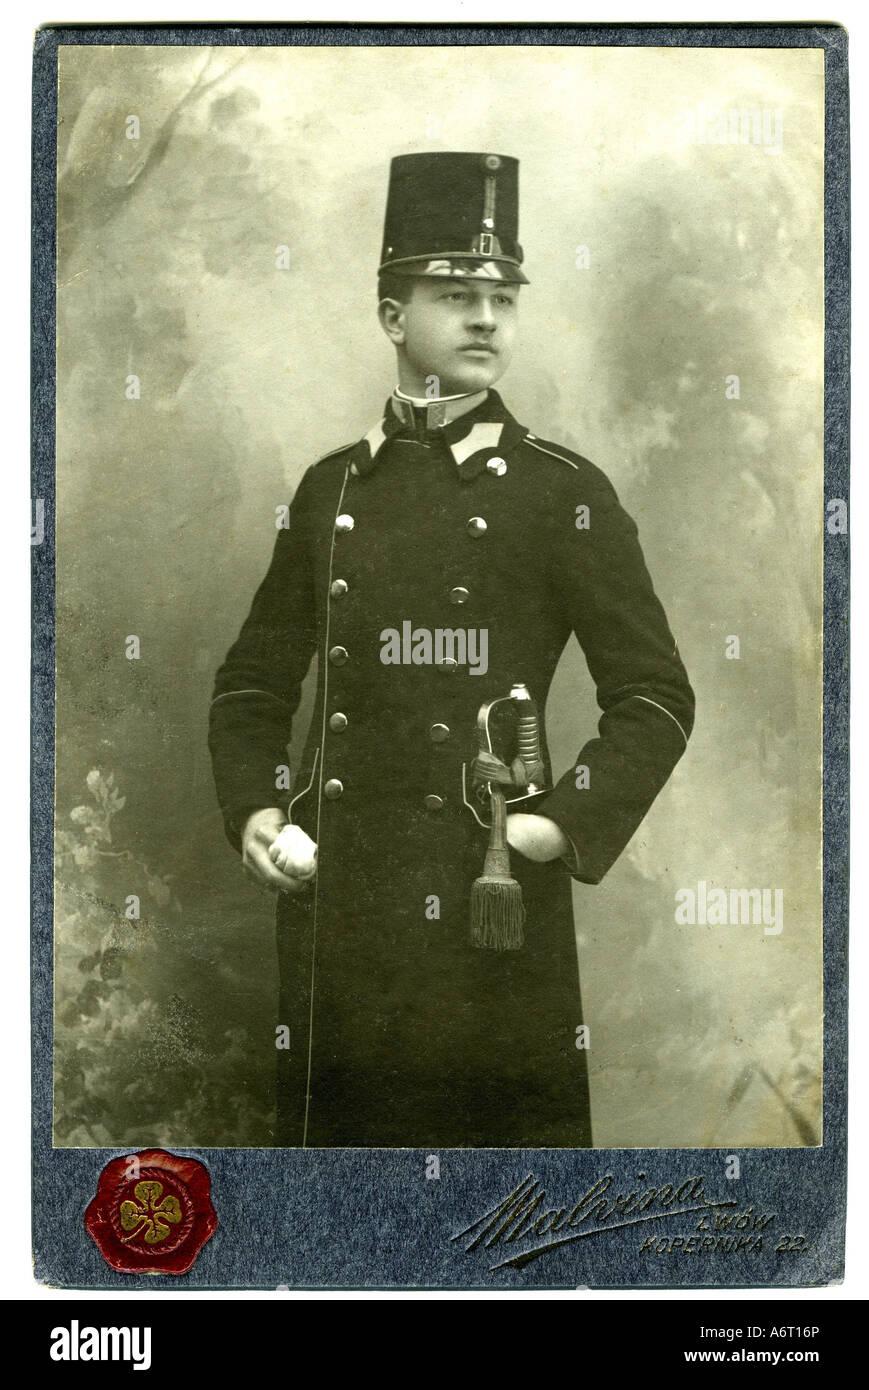 military, Austria-Hungary, uniforms, officers, Lieutenant, photograph by Studio Malvina, Lviv circa 1905, Additional - Stock Image